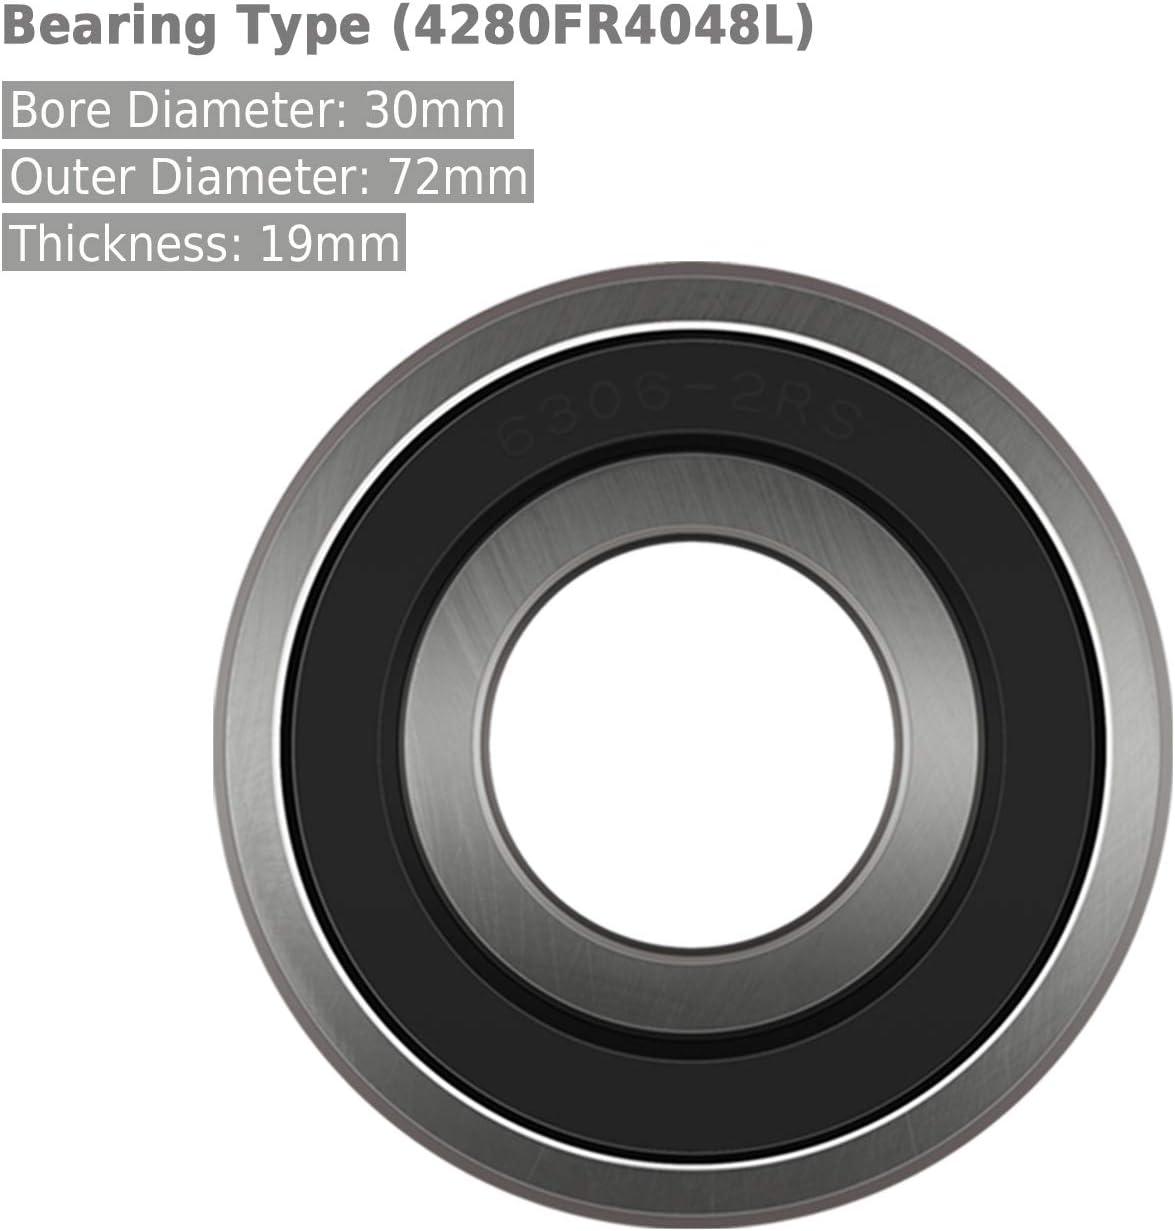 Yoursme Front or Rear Wheel Bearing Replaces Polaris Part # 3514699 for Polaris RZR XP 1000 14-up 2PCS